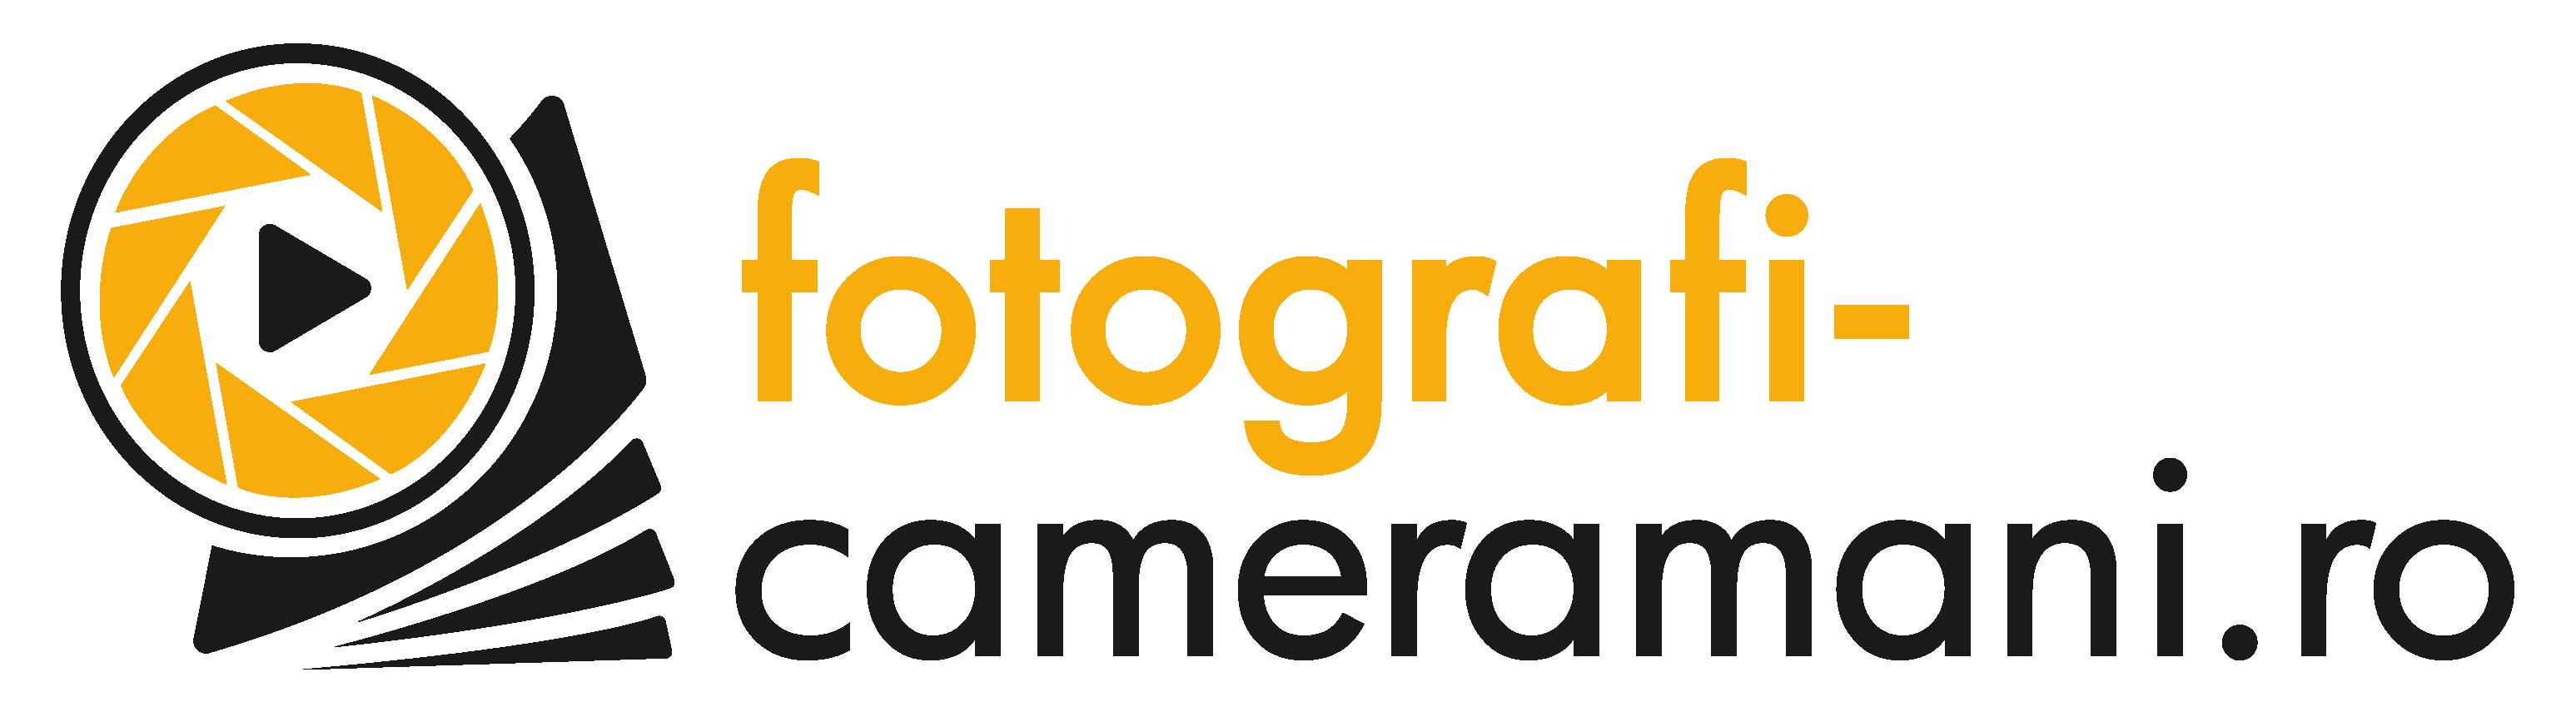 Suntem prezenti si pe Fotografi-cameramani.ro